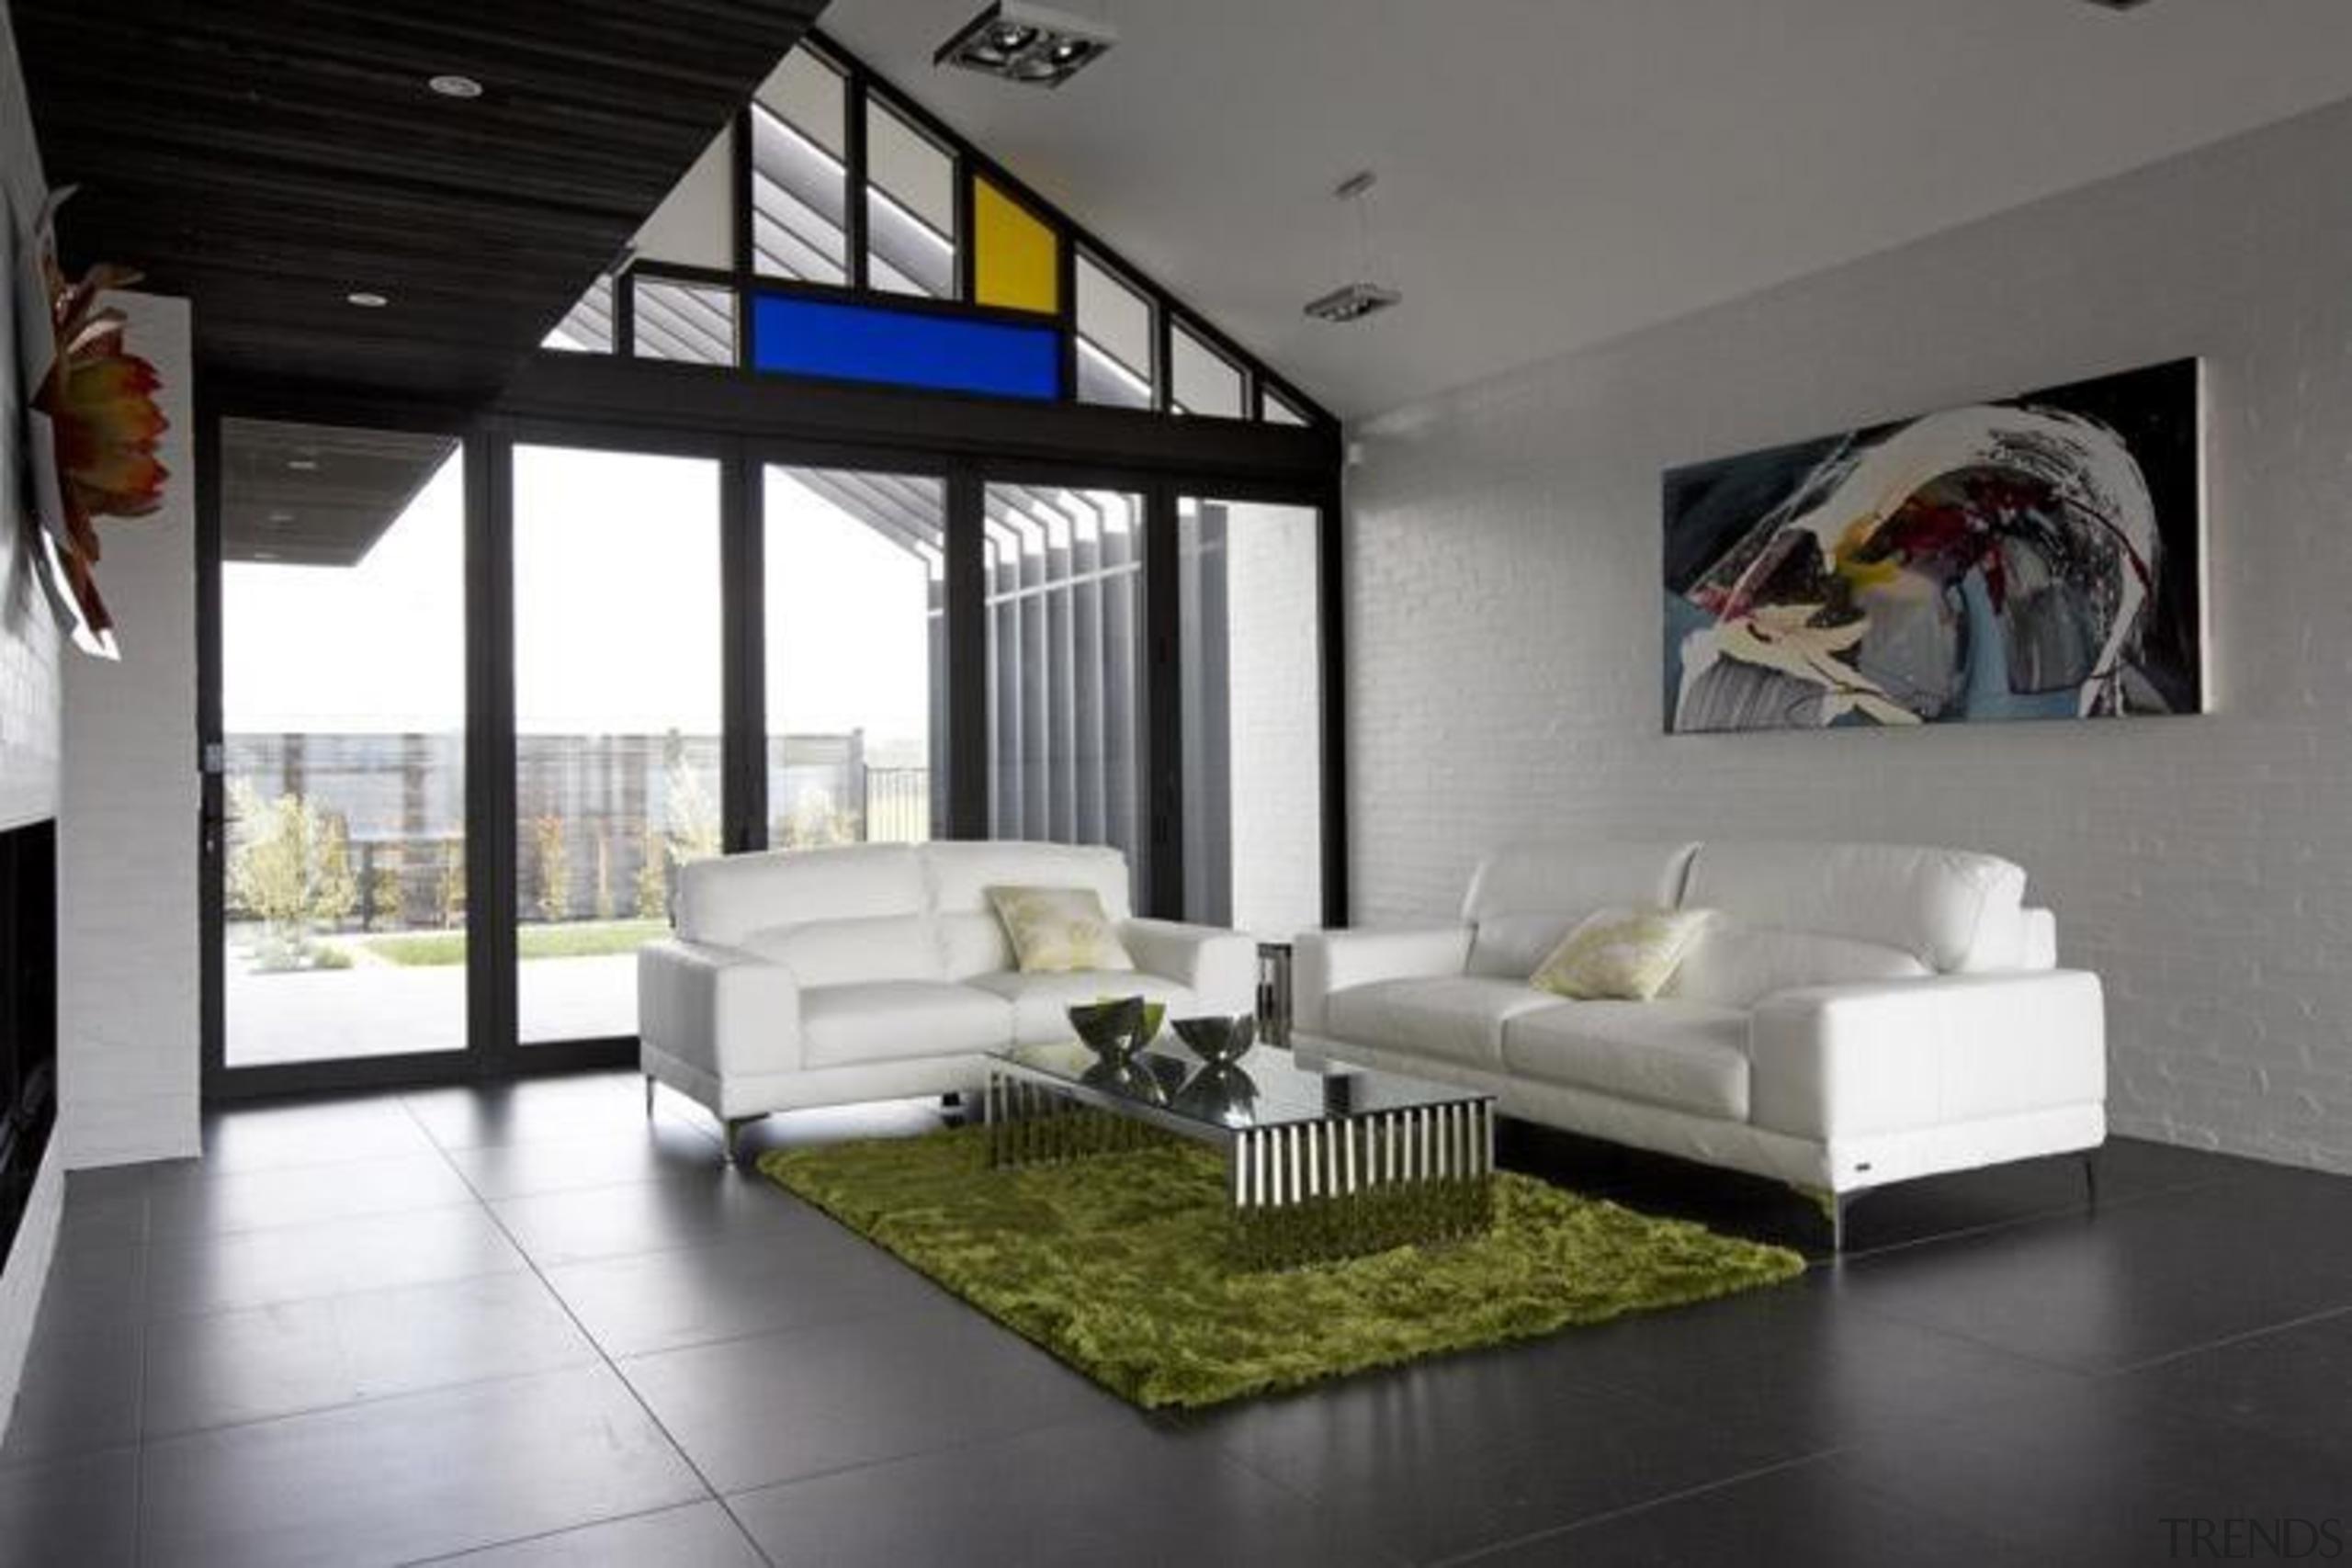 Ivory black lounge floor. - Blue Mountain Range architecture, ceiling, floor, house, interior design, living room, gray, black